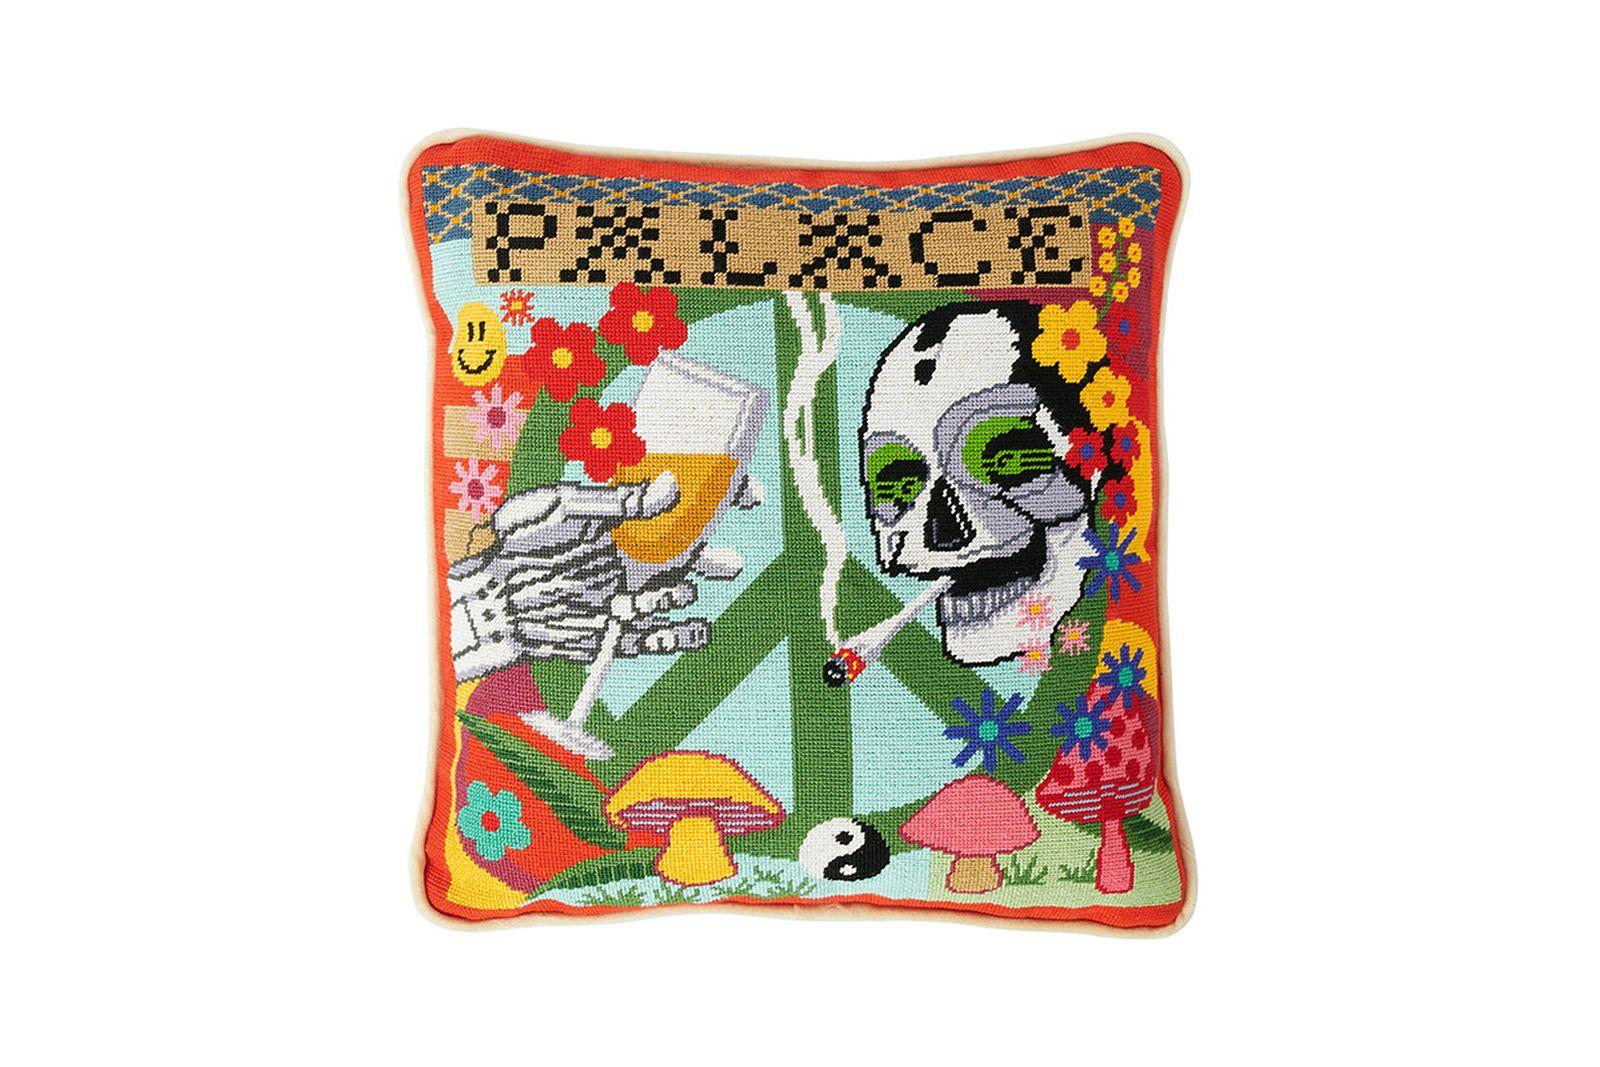 palace-crocs-classic-clog-release-date-price-20